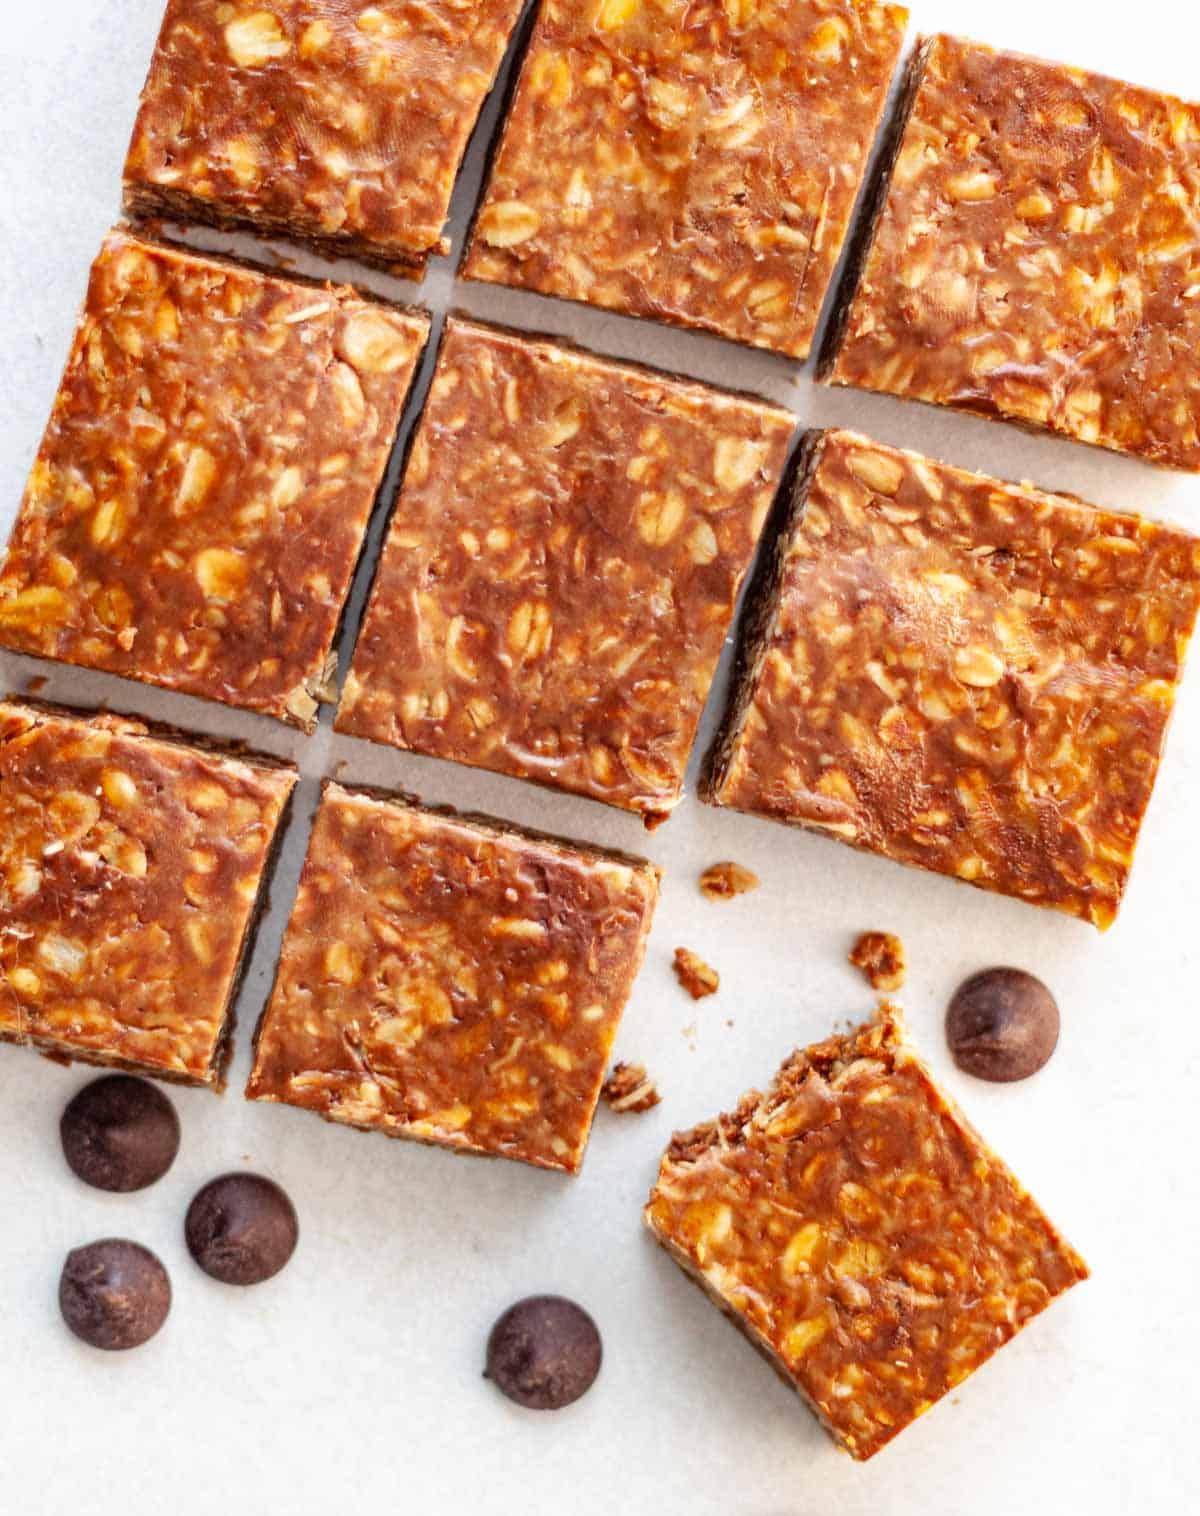 homemade nut-free granola bars